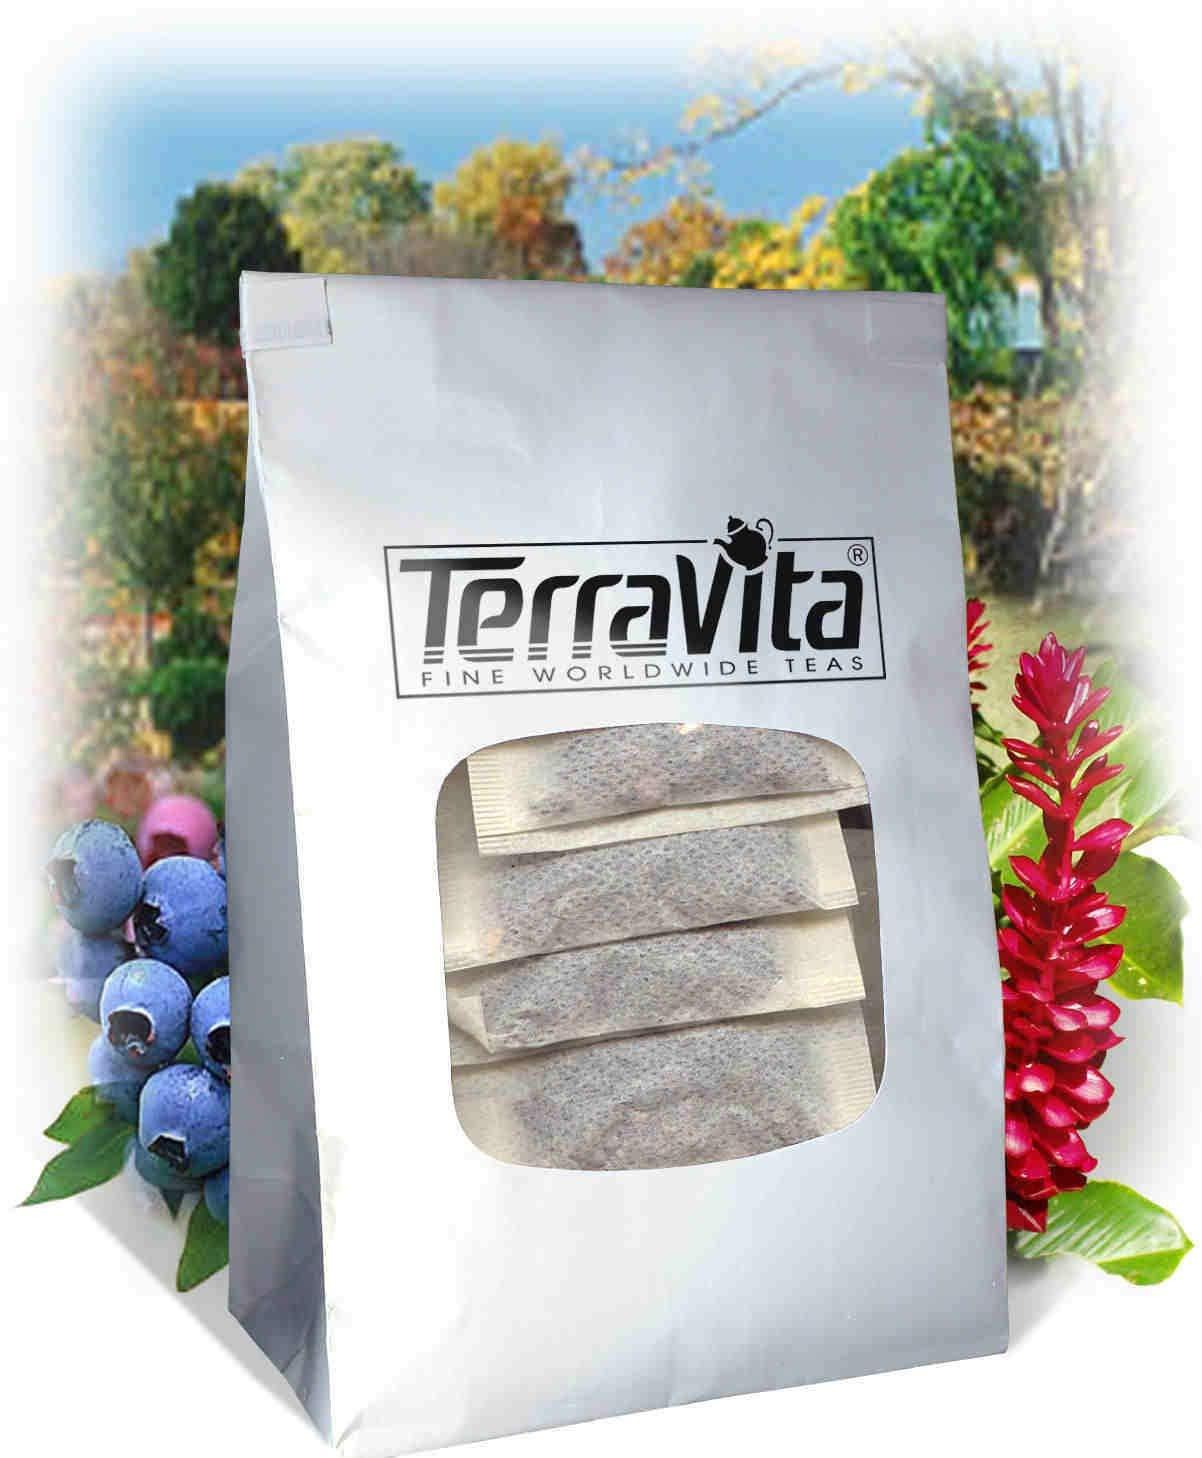 Breast Enhancement Formula Tea - Fenugreek, Saw Palmetto and Wild Yam (50 Tea Bags, ZIN: 514012) - 2 Pack